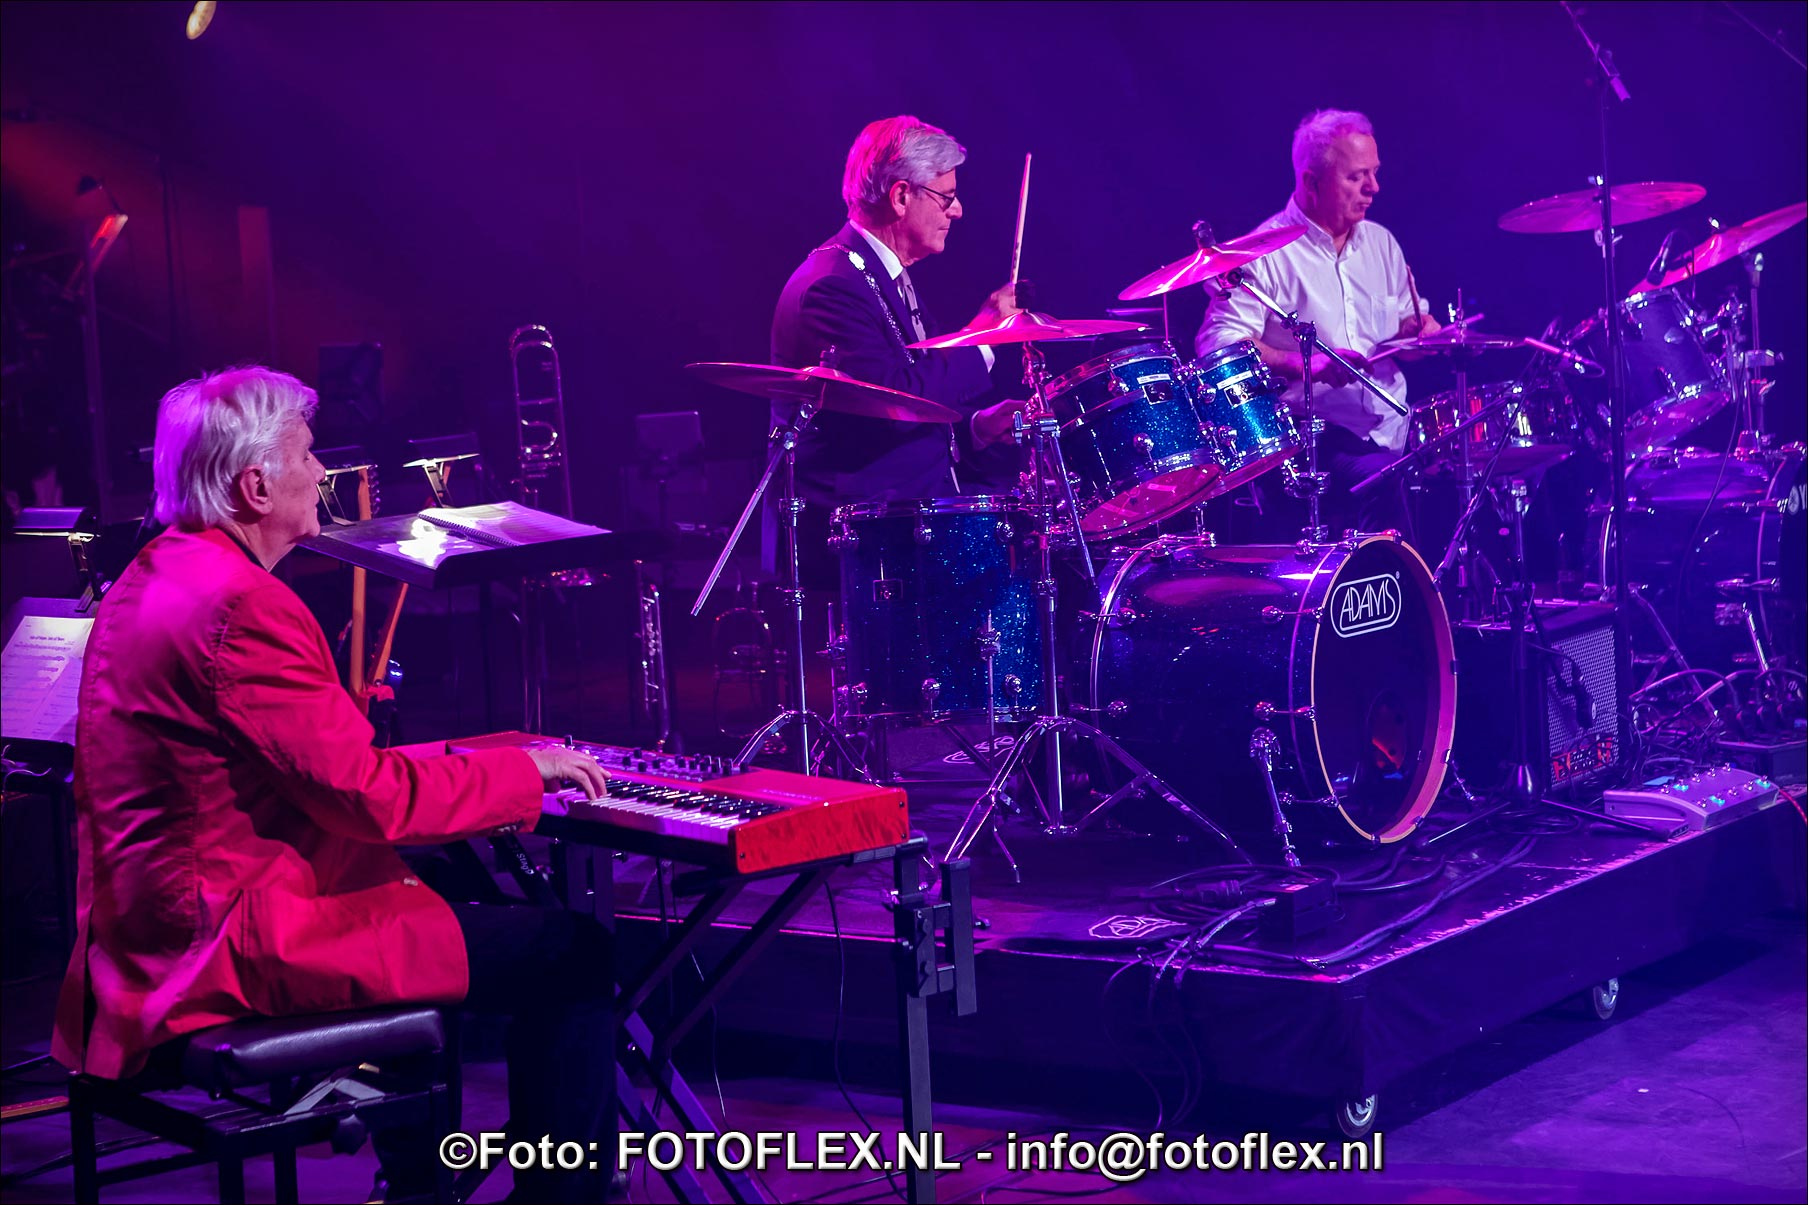 0277-CopyrightFOTOFLEX.NL07012020